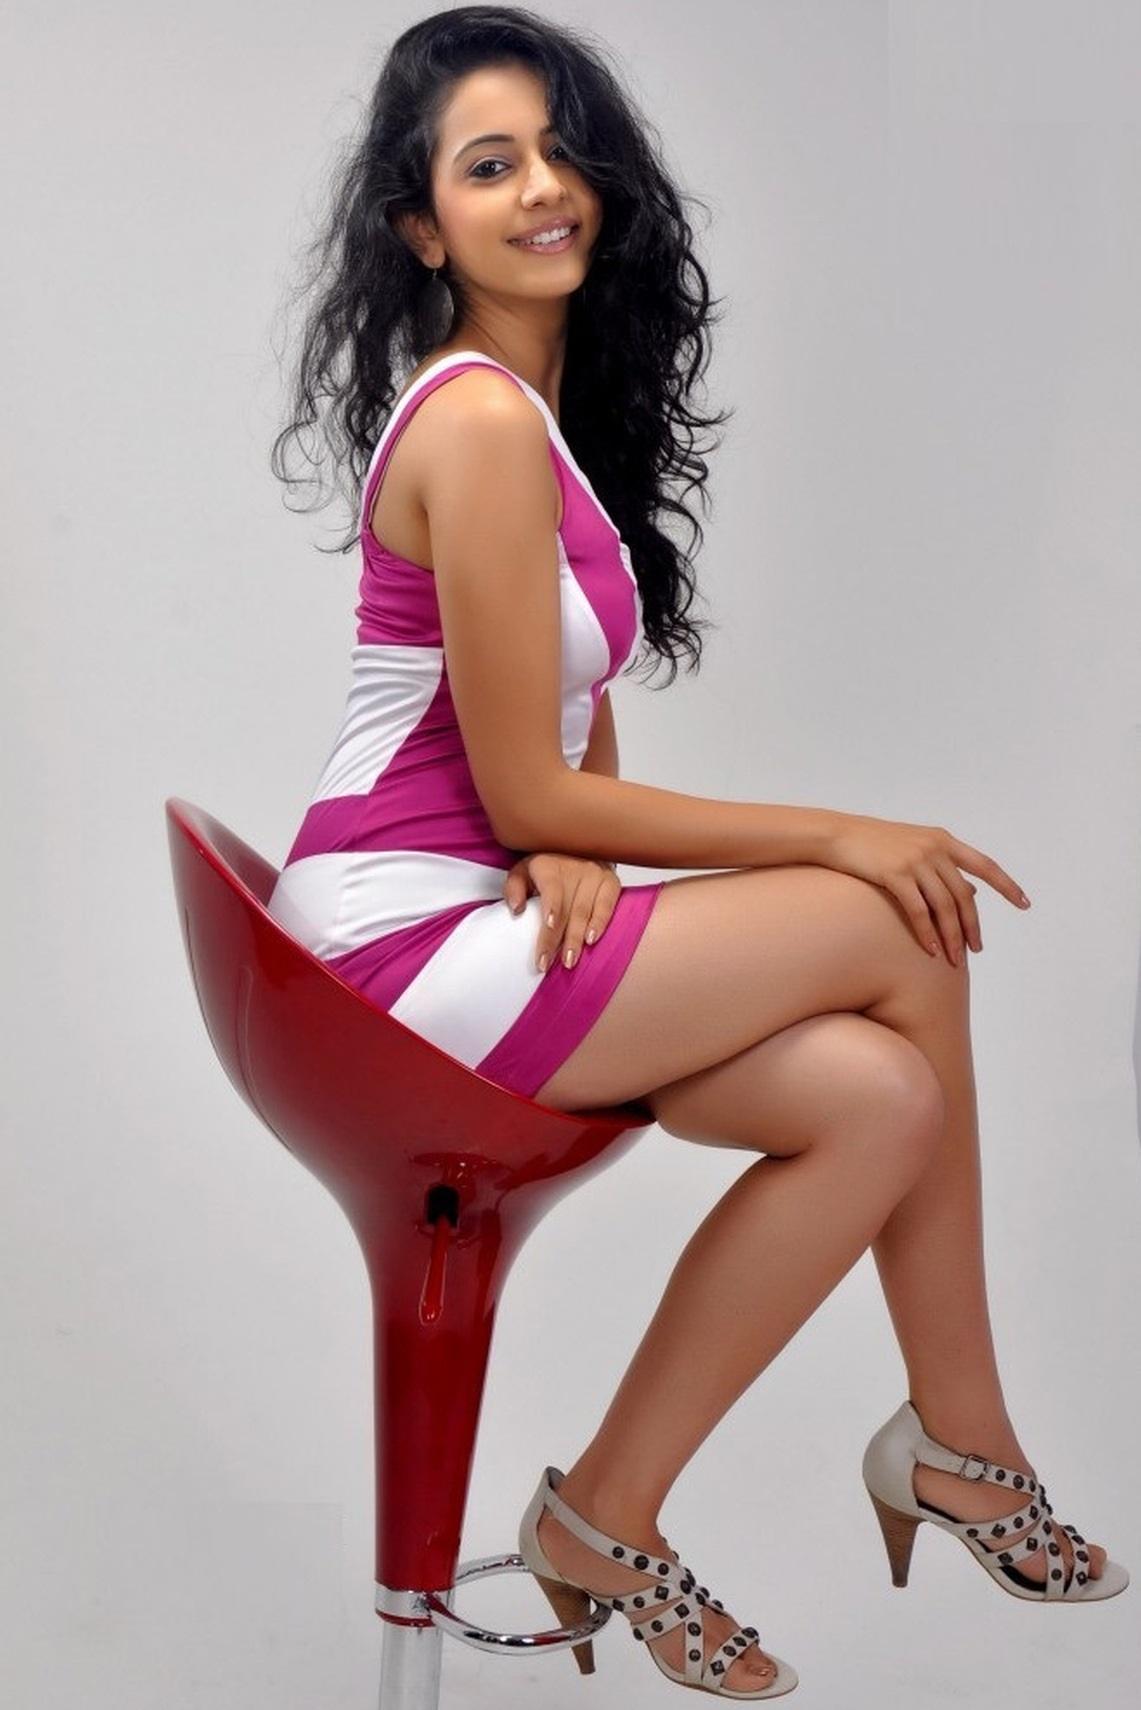 Rakul Preet Singh Rare Photoshoot Photos in White and Pink Skater Dress